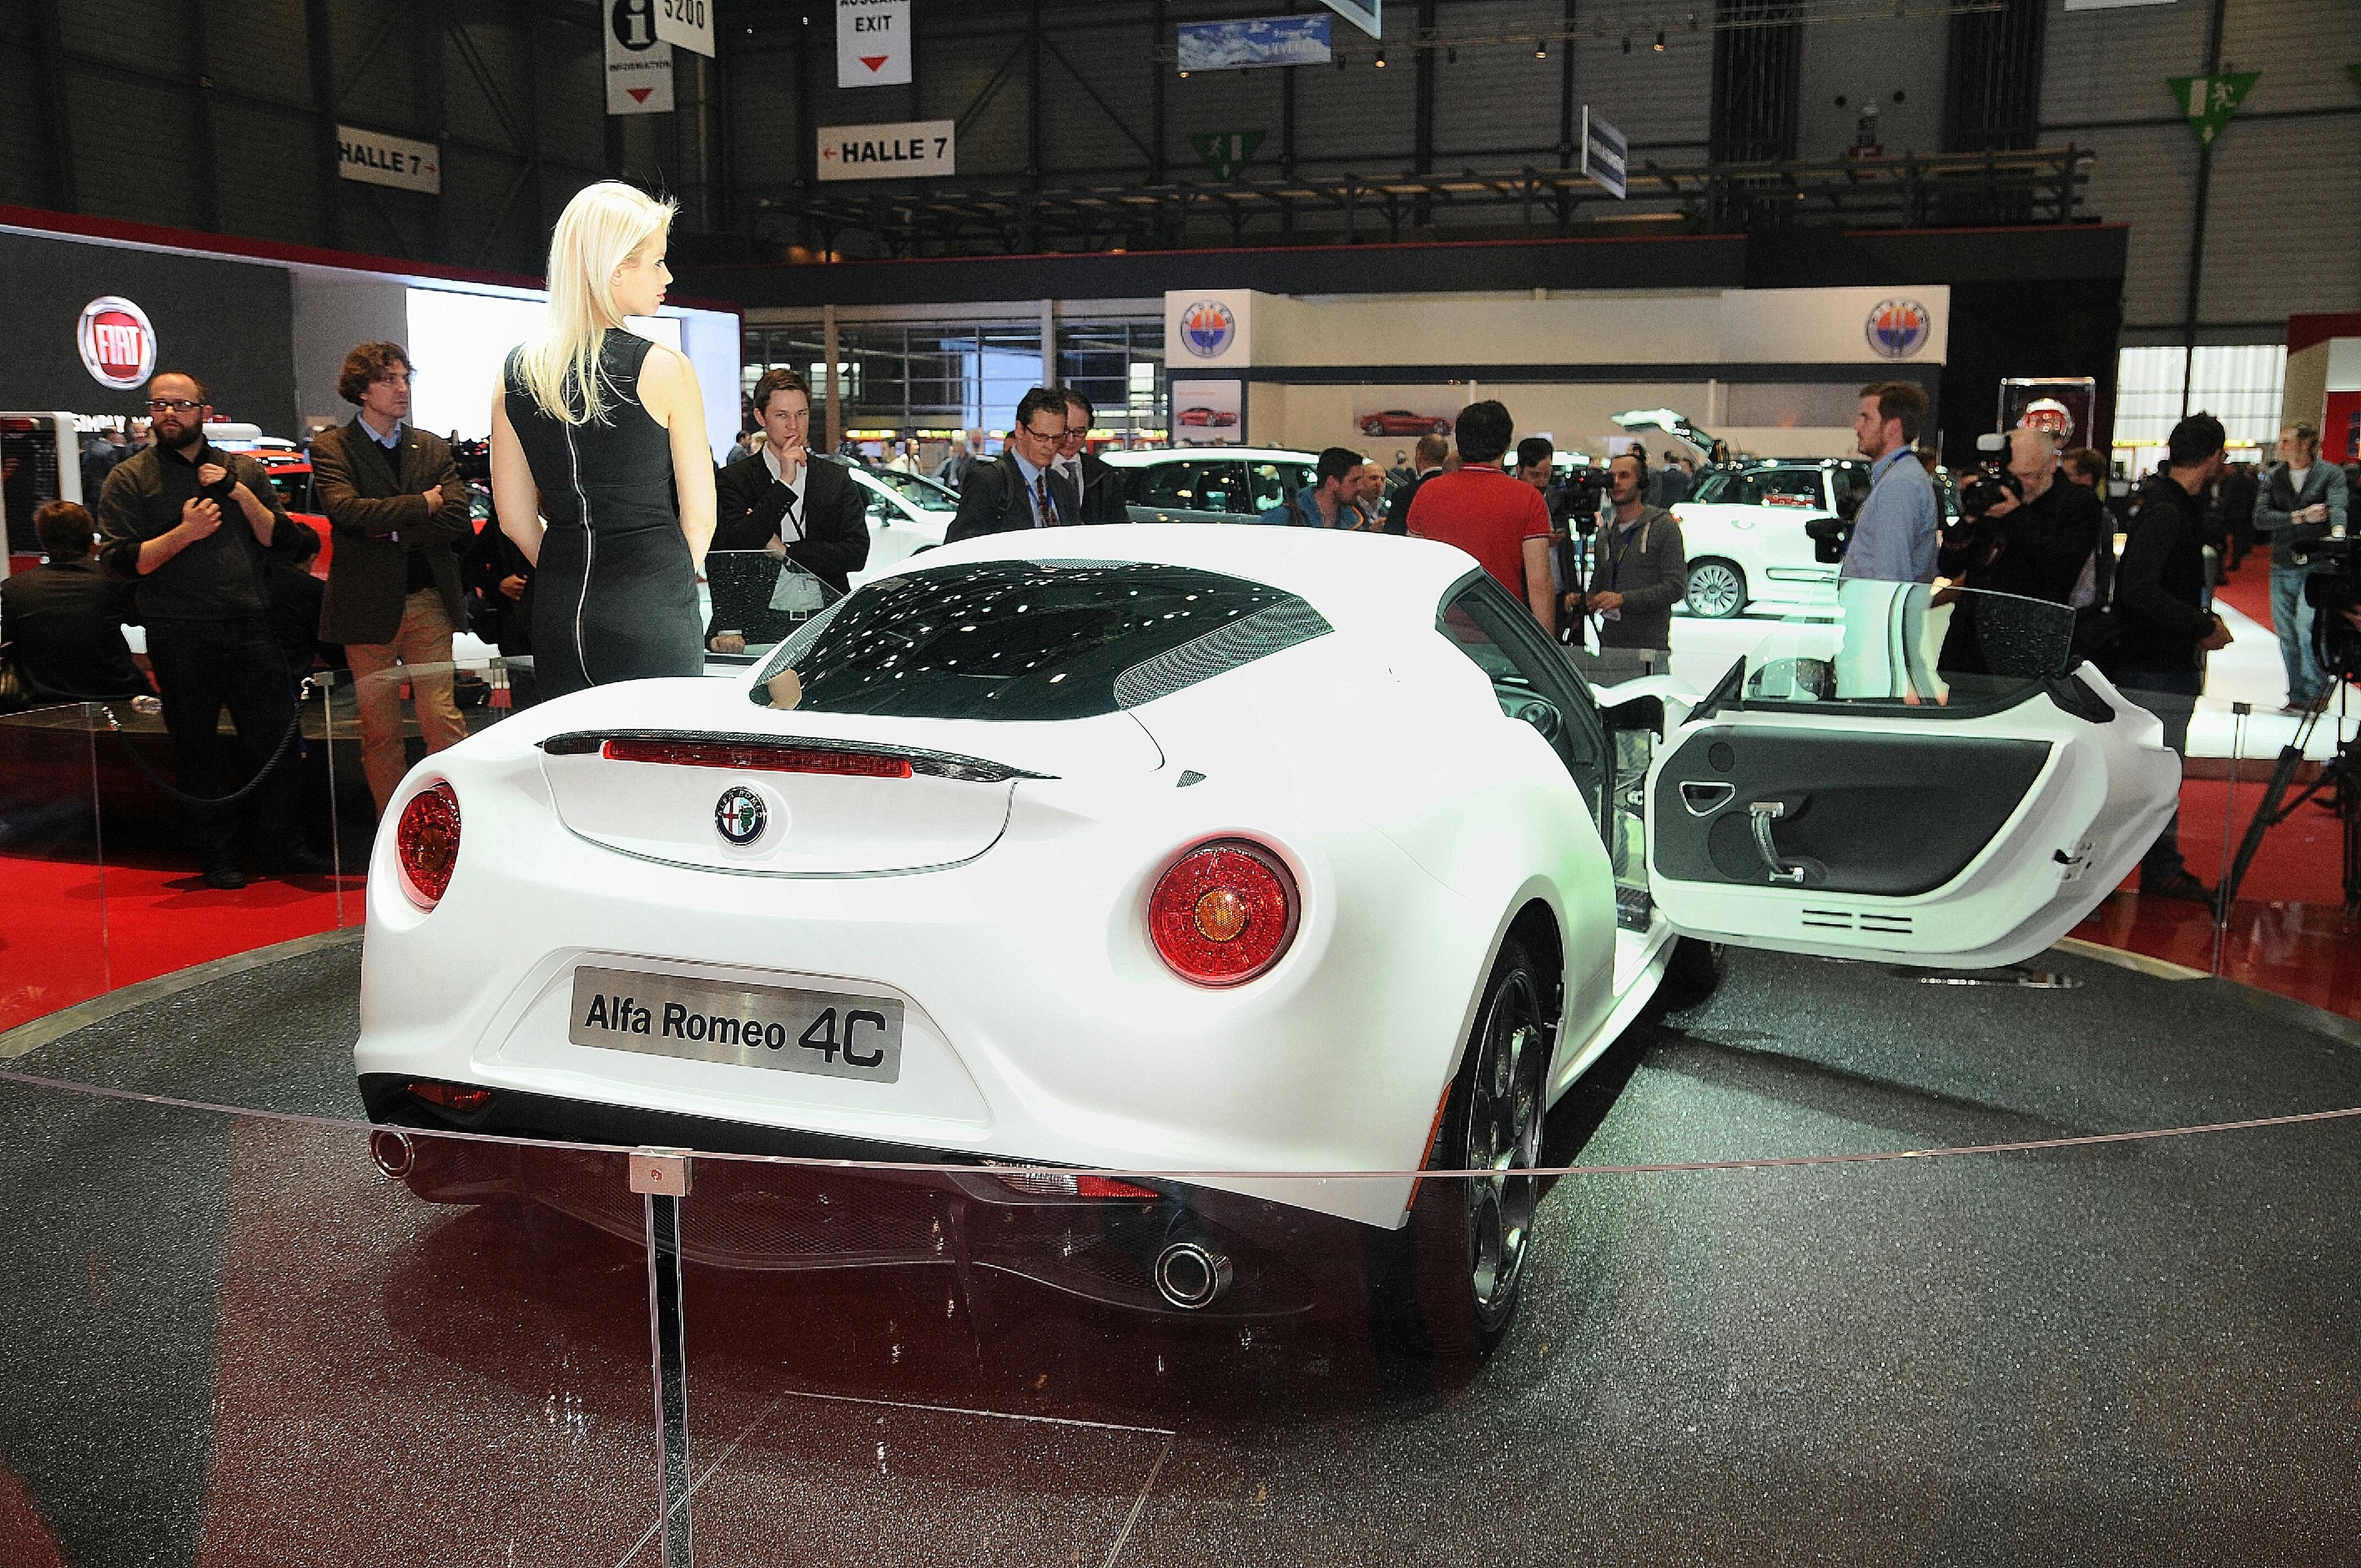 File 13 Italian Supercar Alfa Romeo 4c Exotic Light Dreamcar